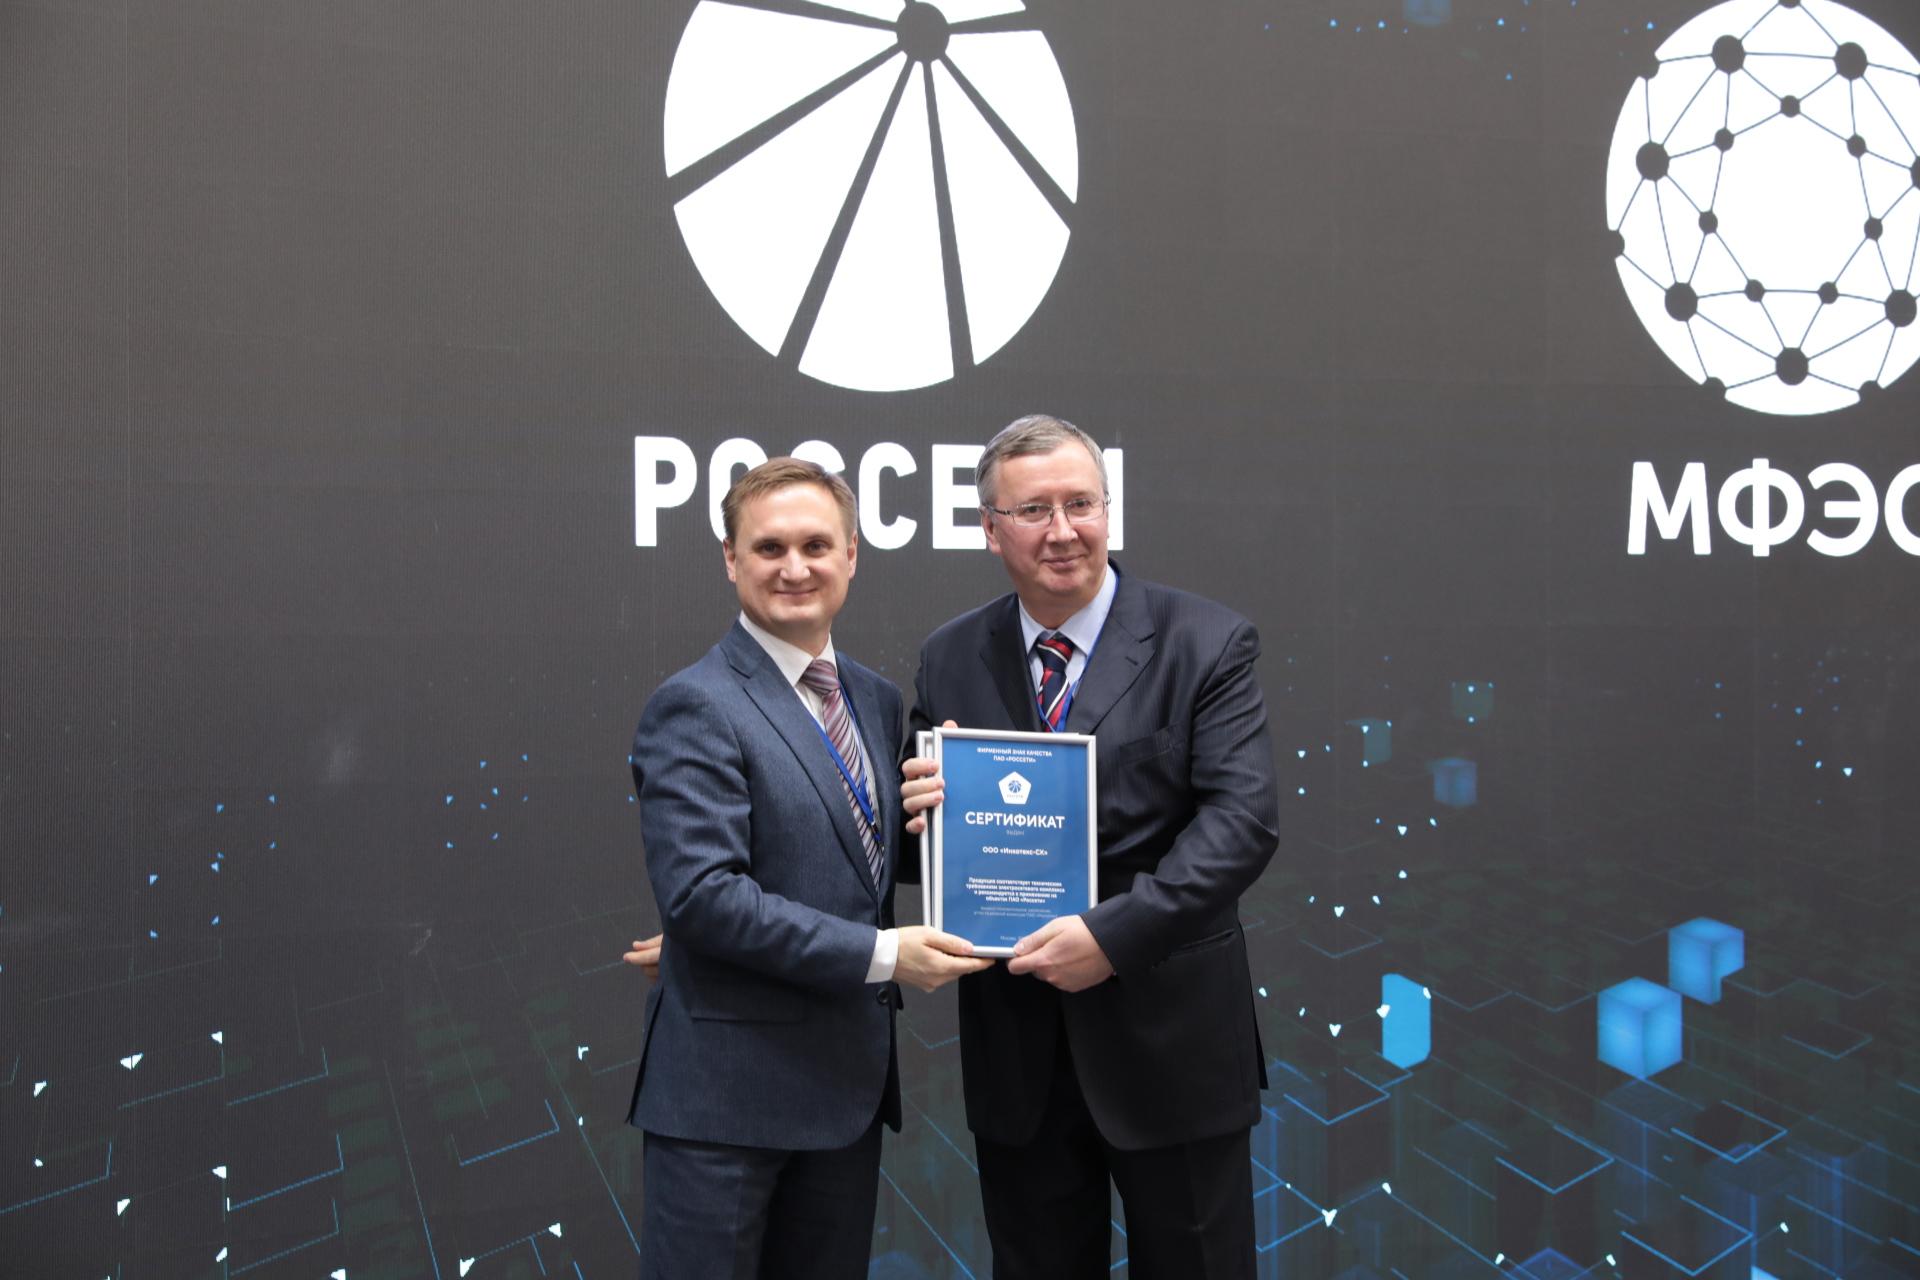 Церемония награждения Инкотекс на МФЭС 2018 (фото «Электрические сети»)